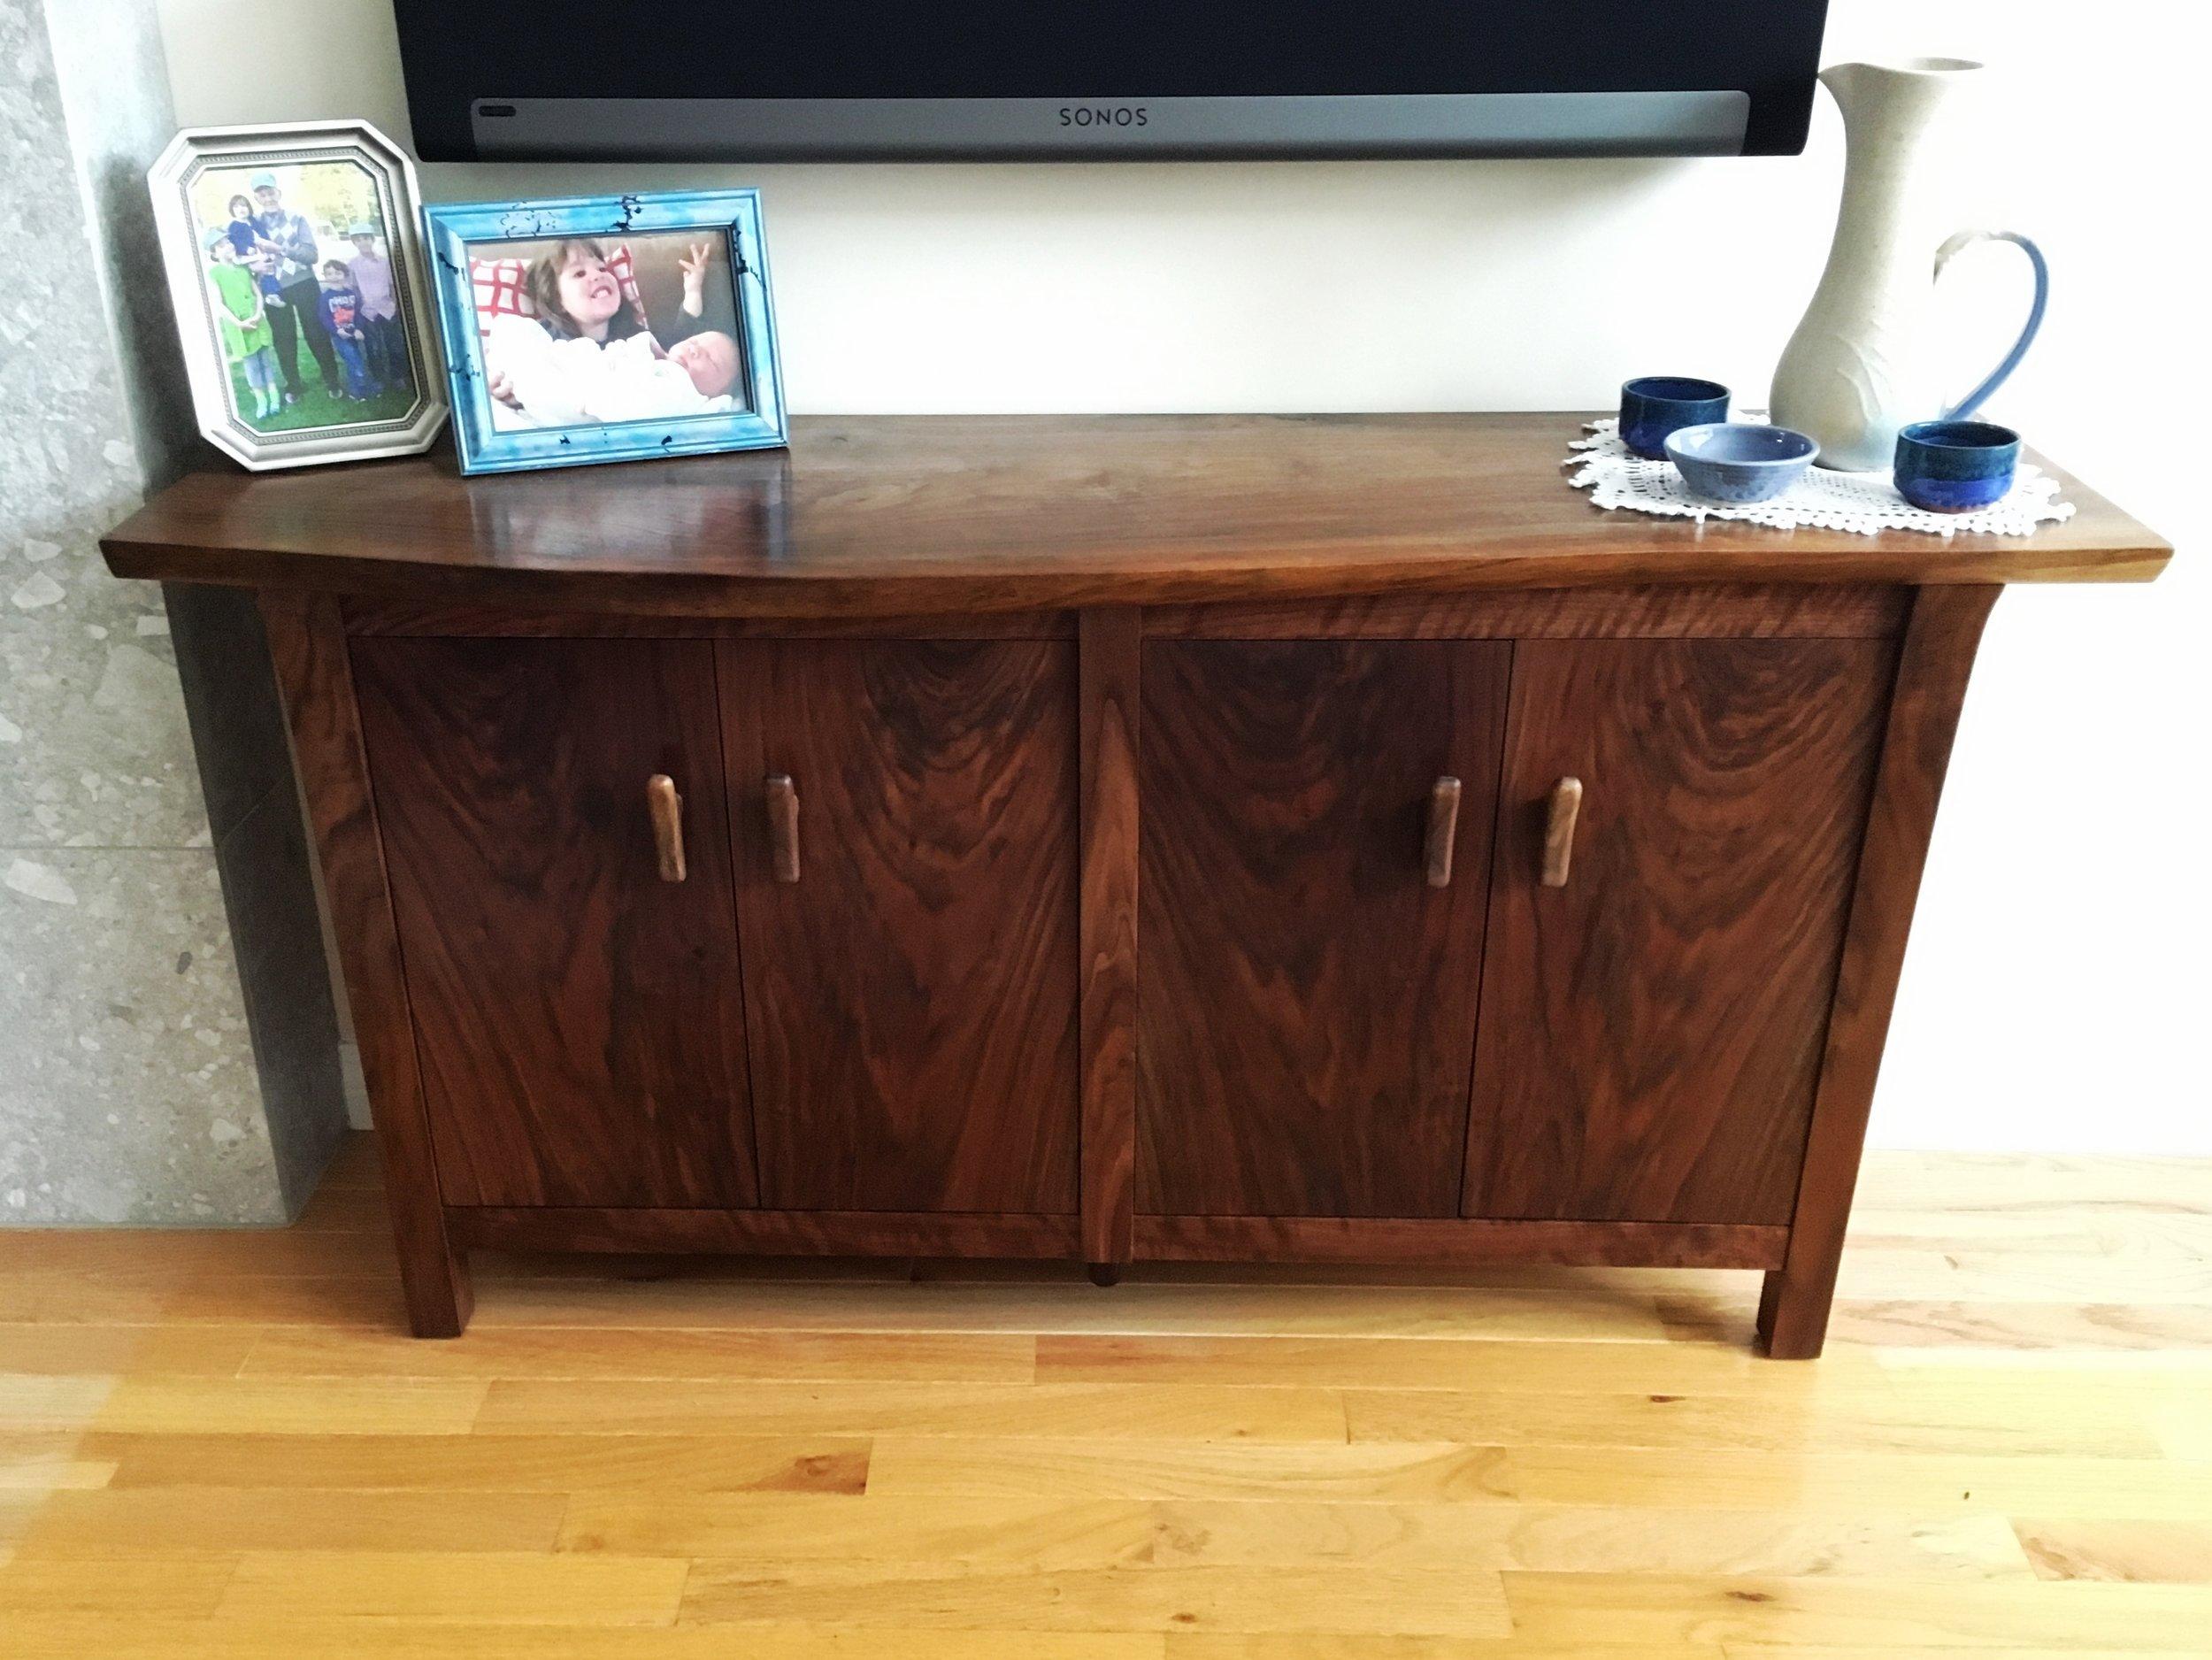 walnut-sideboard-cabinet_27411181610_o.jpg